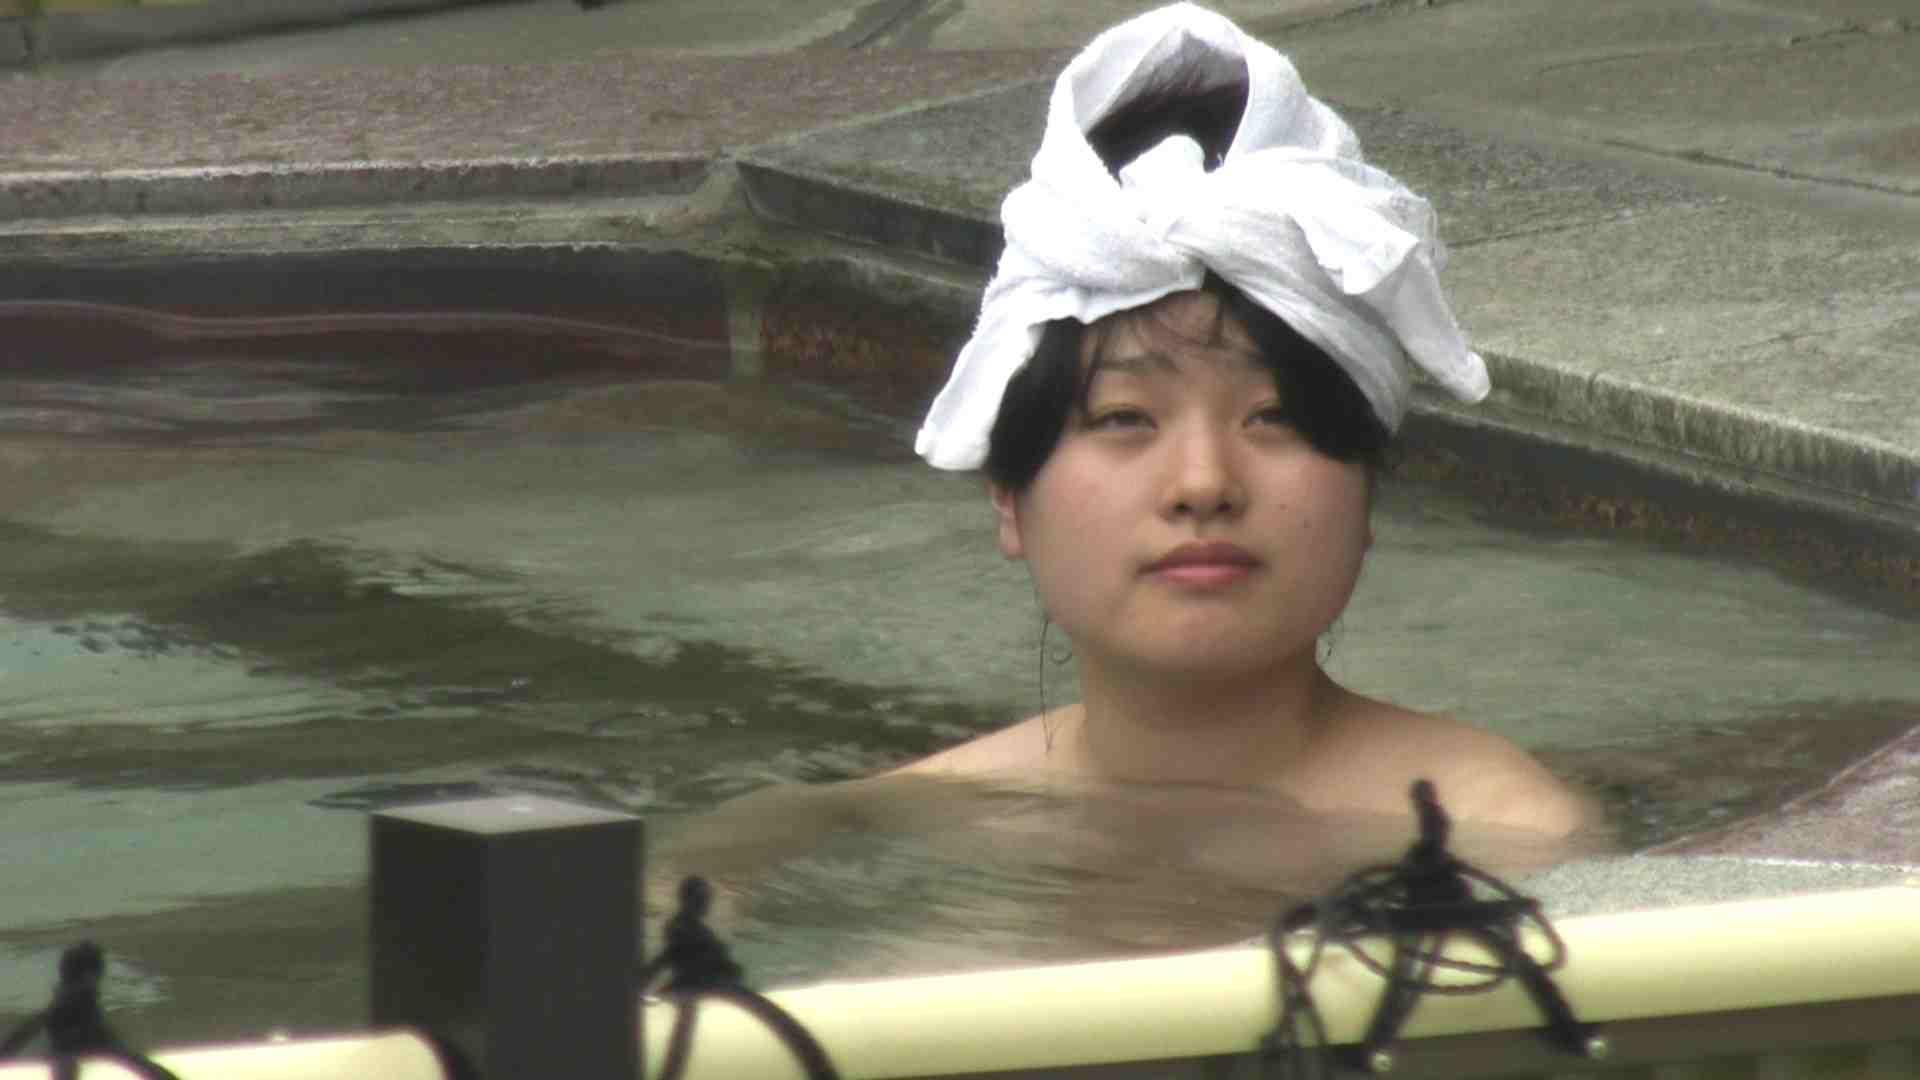 Aquaな露天風呂Vol.185 盗撮   HなOL  102pic 33